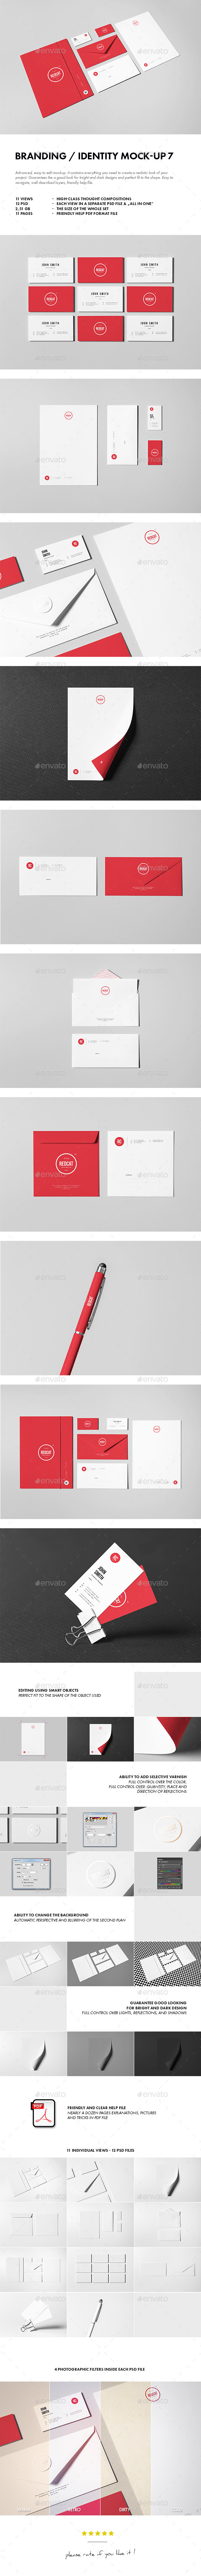 Branding / Identity Mock-up 7 - Stationery Print